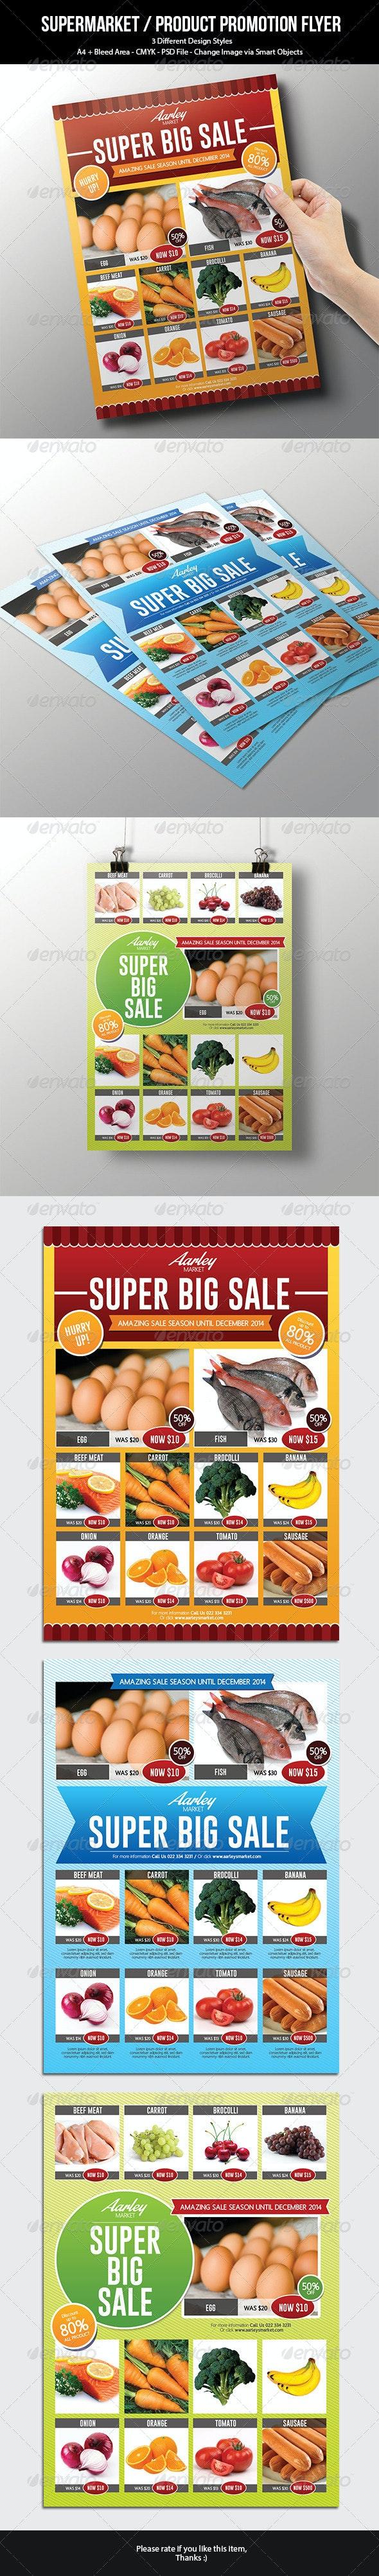 Supermarket / Product Promotion Flyer - Commerce Flyers